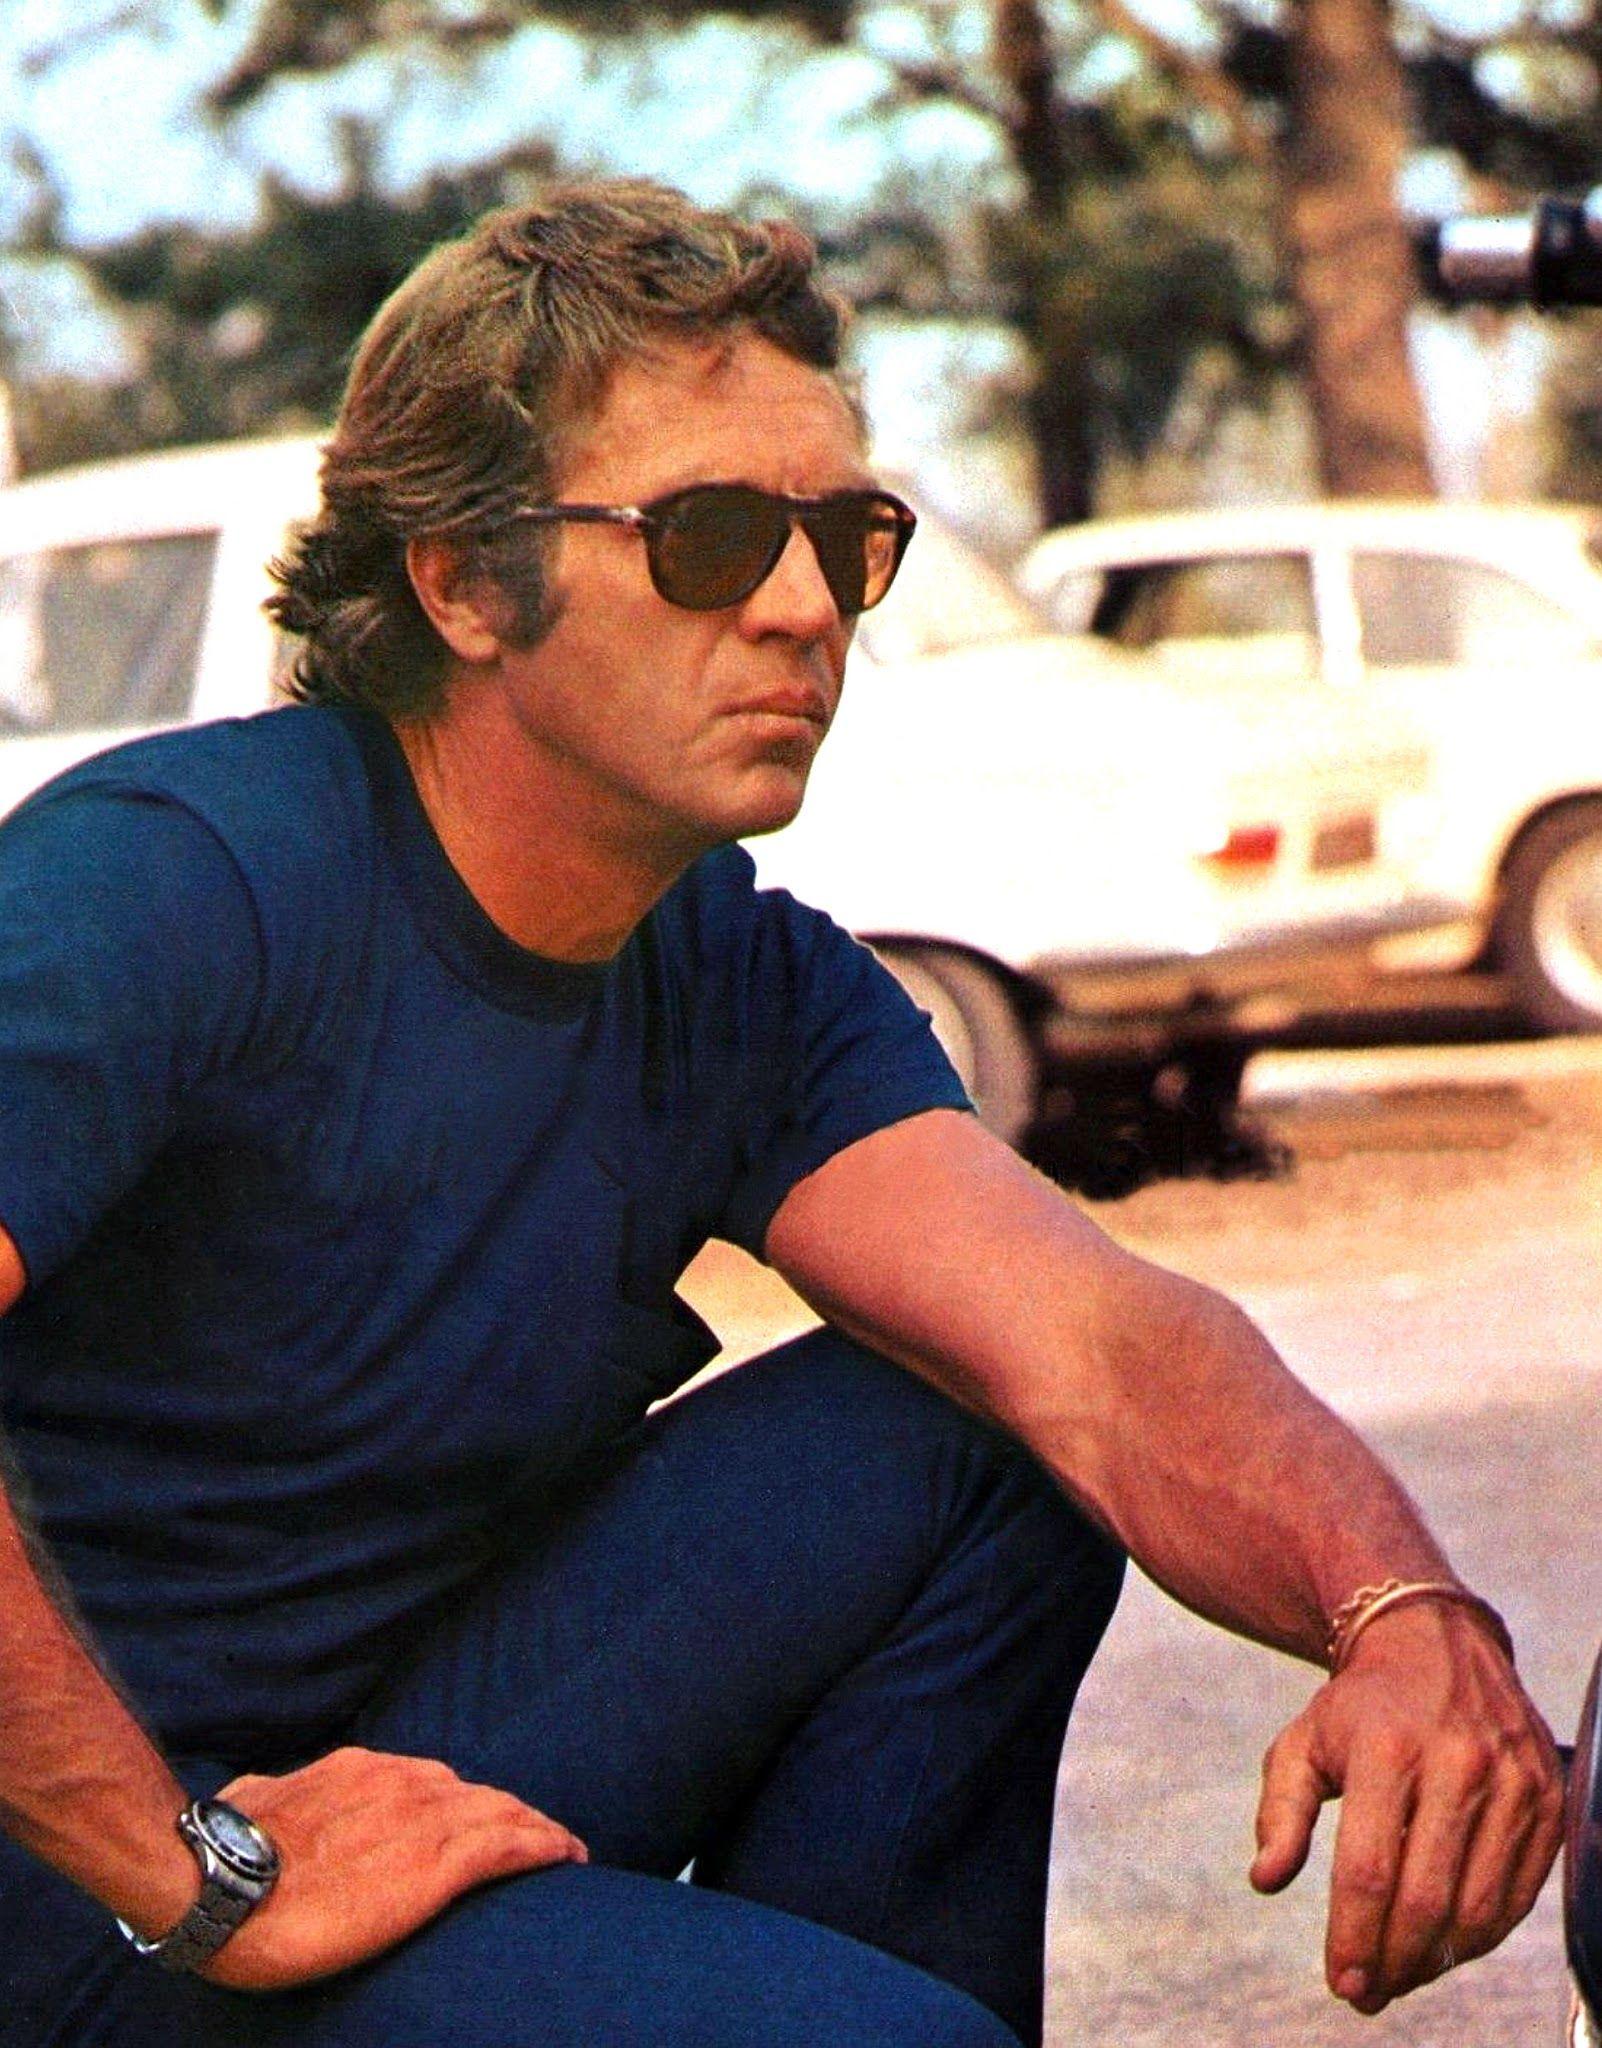 Steve-McQueen-Rolex-Submariner-with-Persol-Sunglasses.jpg ...